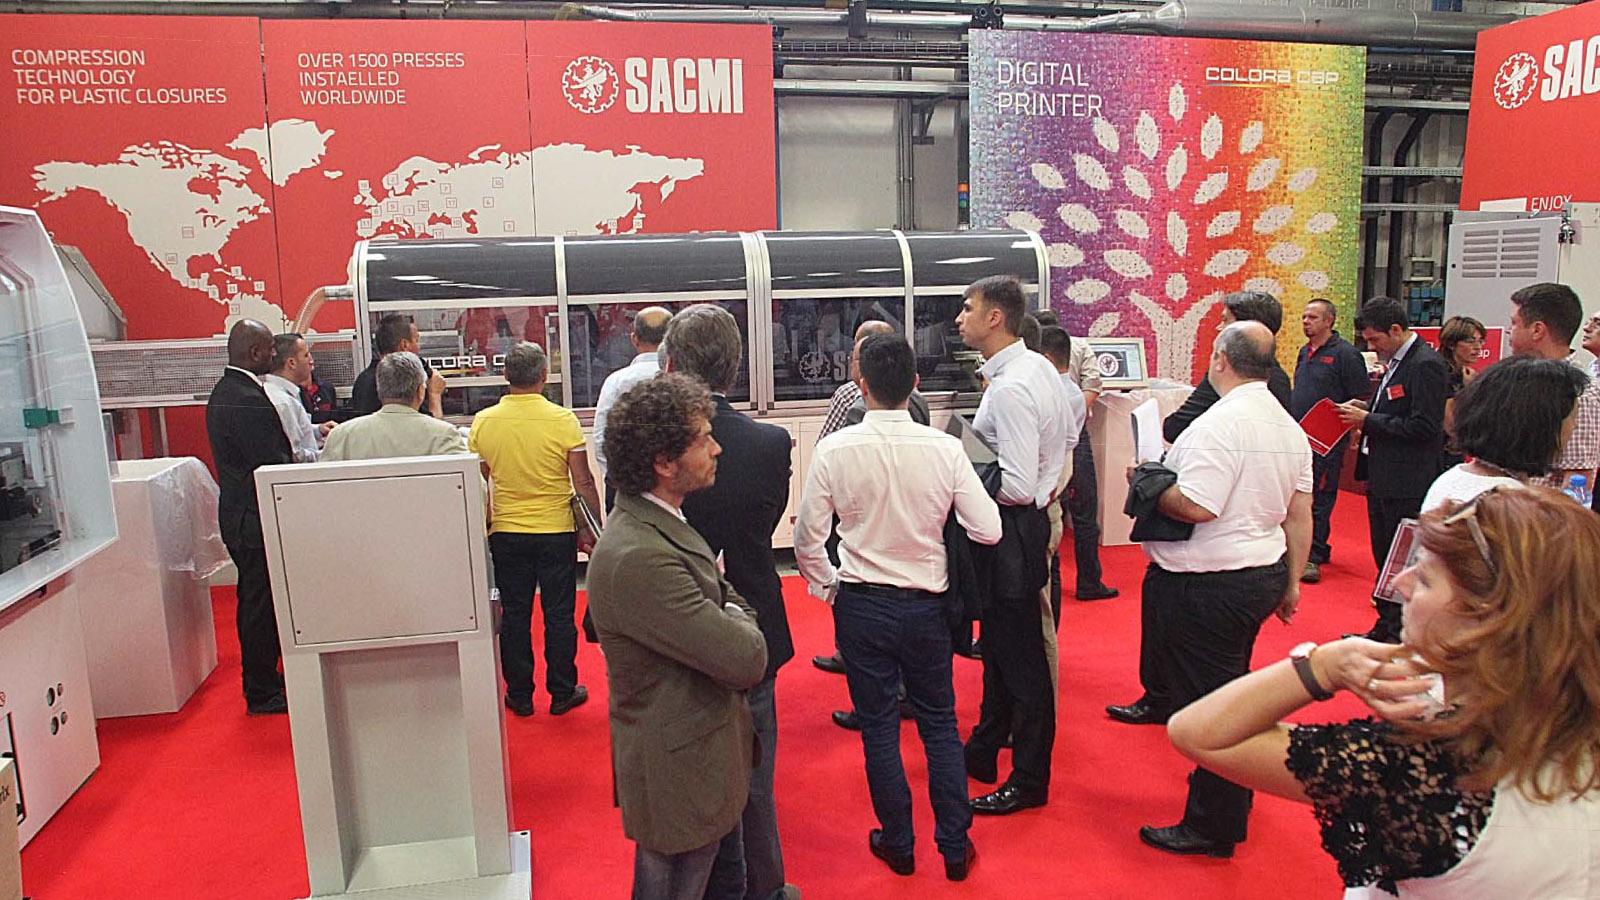 sacmi-plasticday-2015-compression